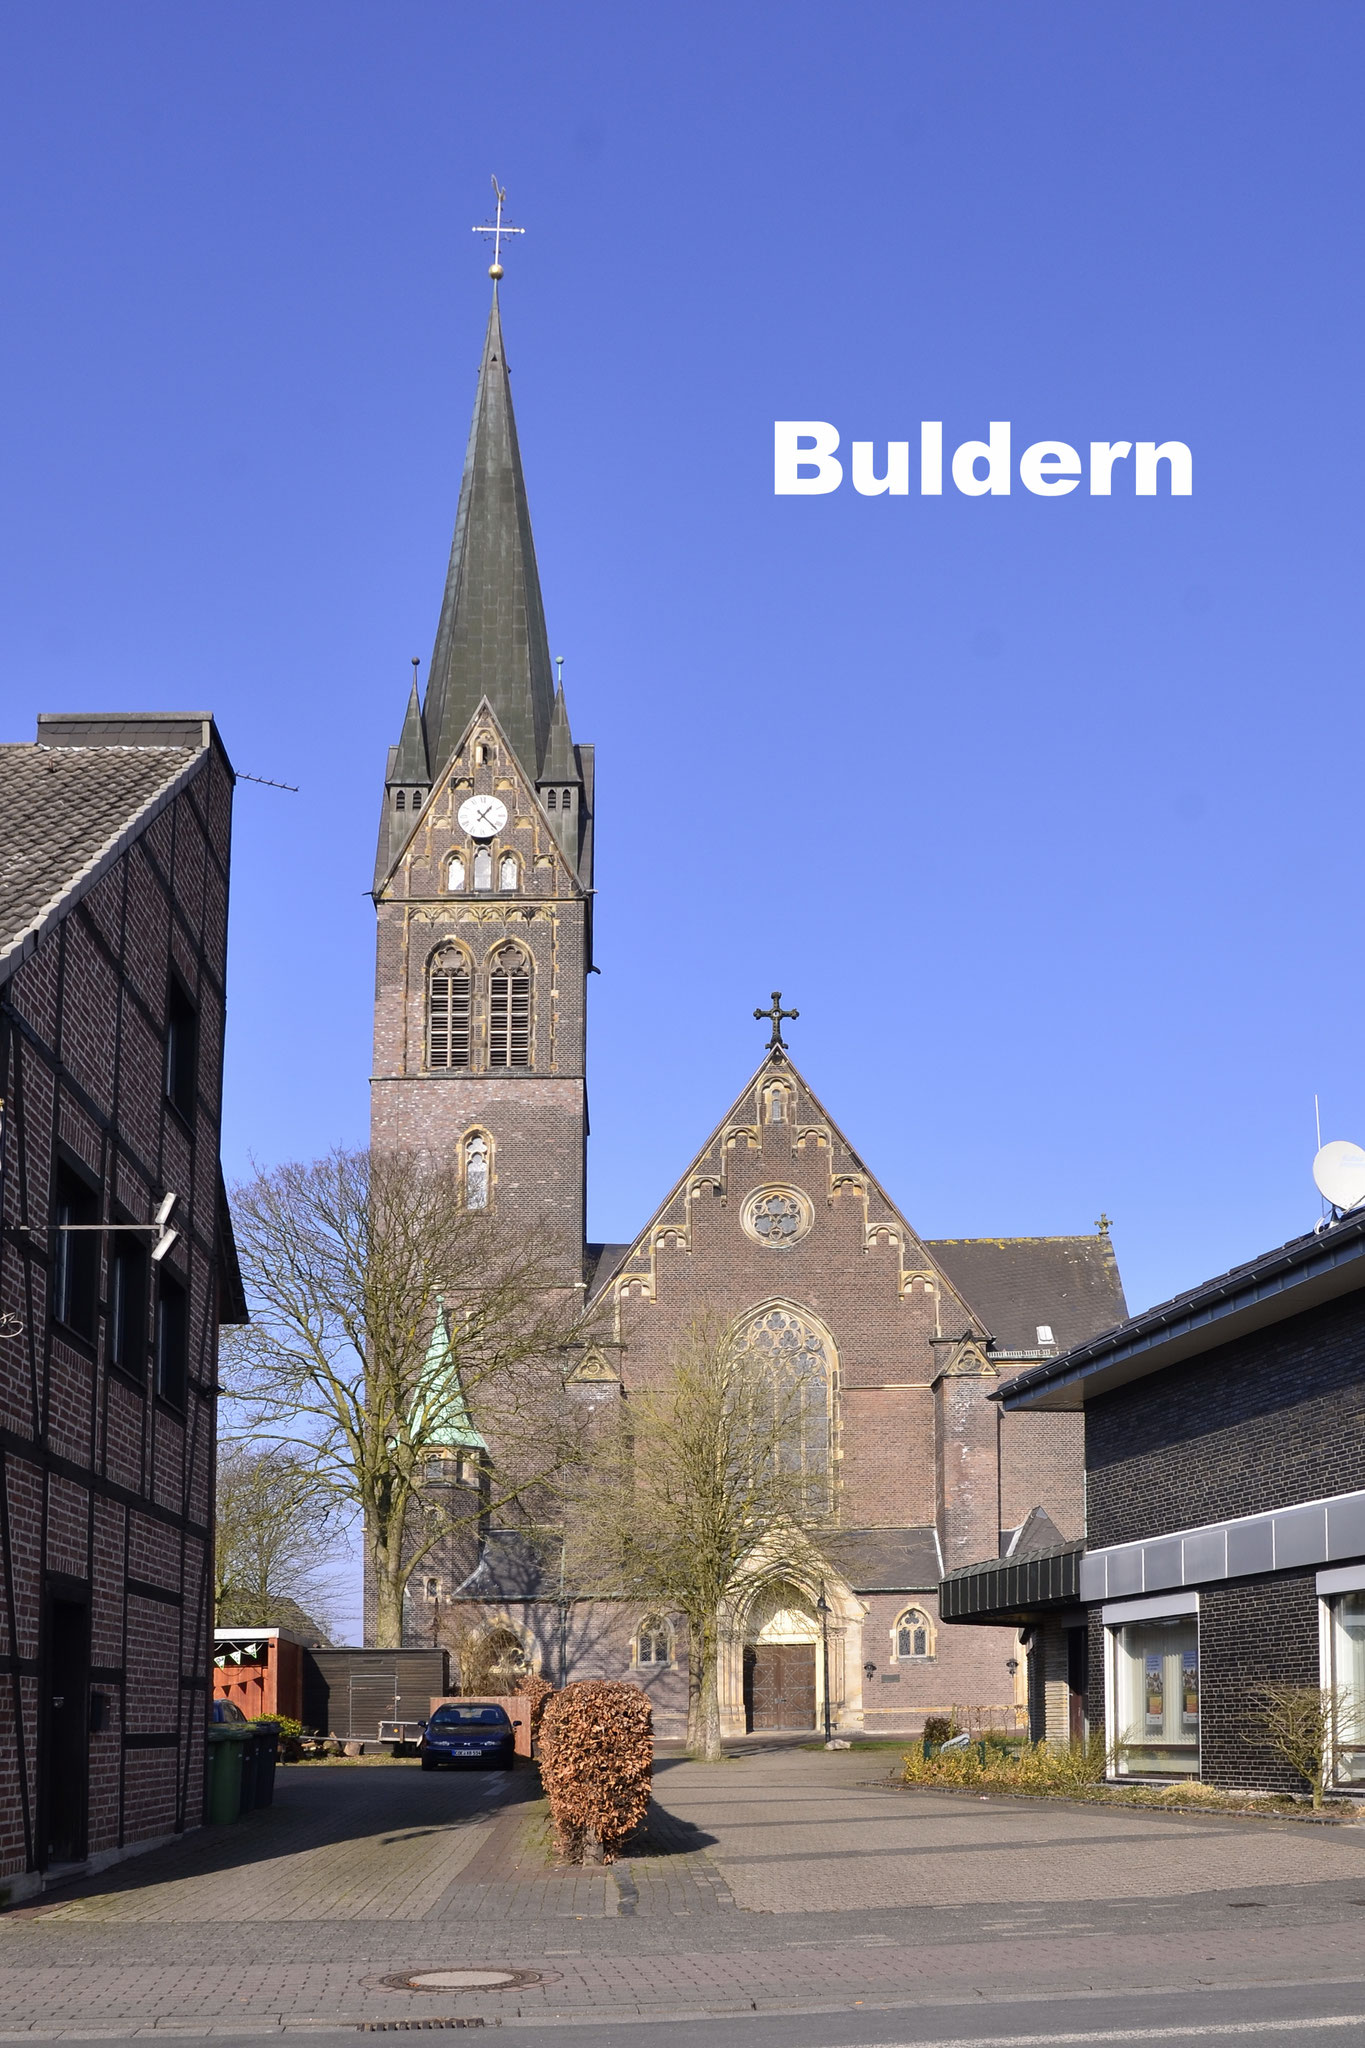 BULDERN